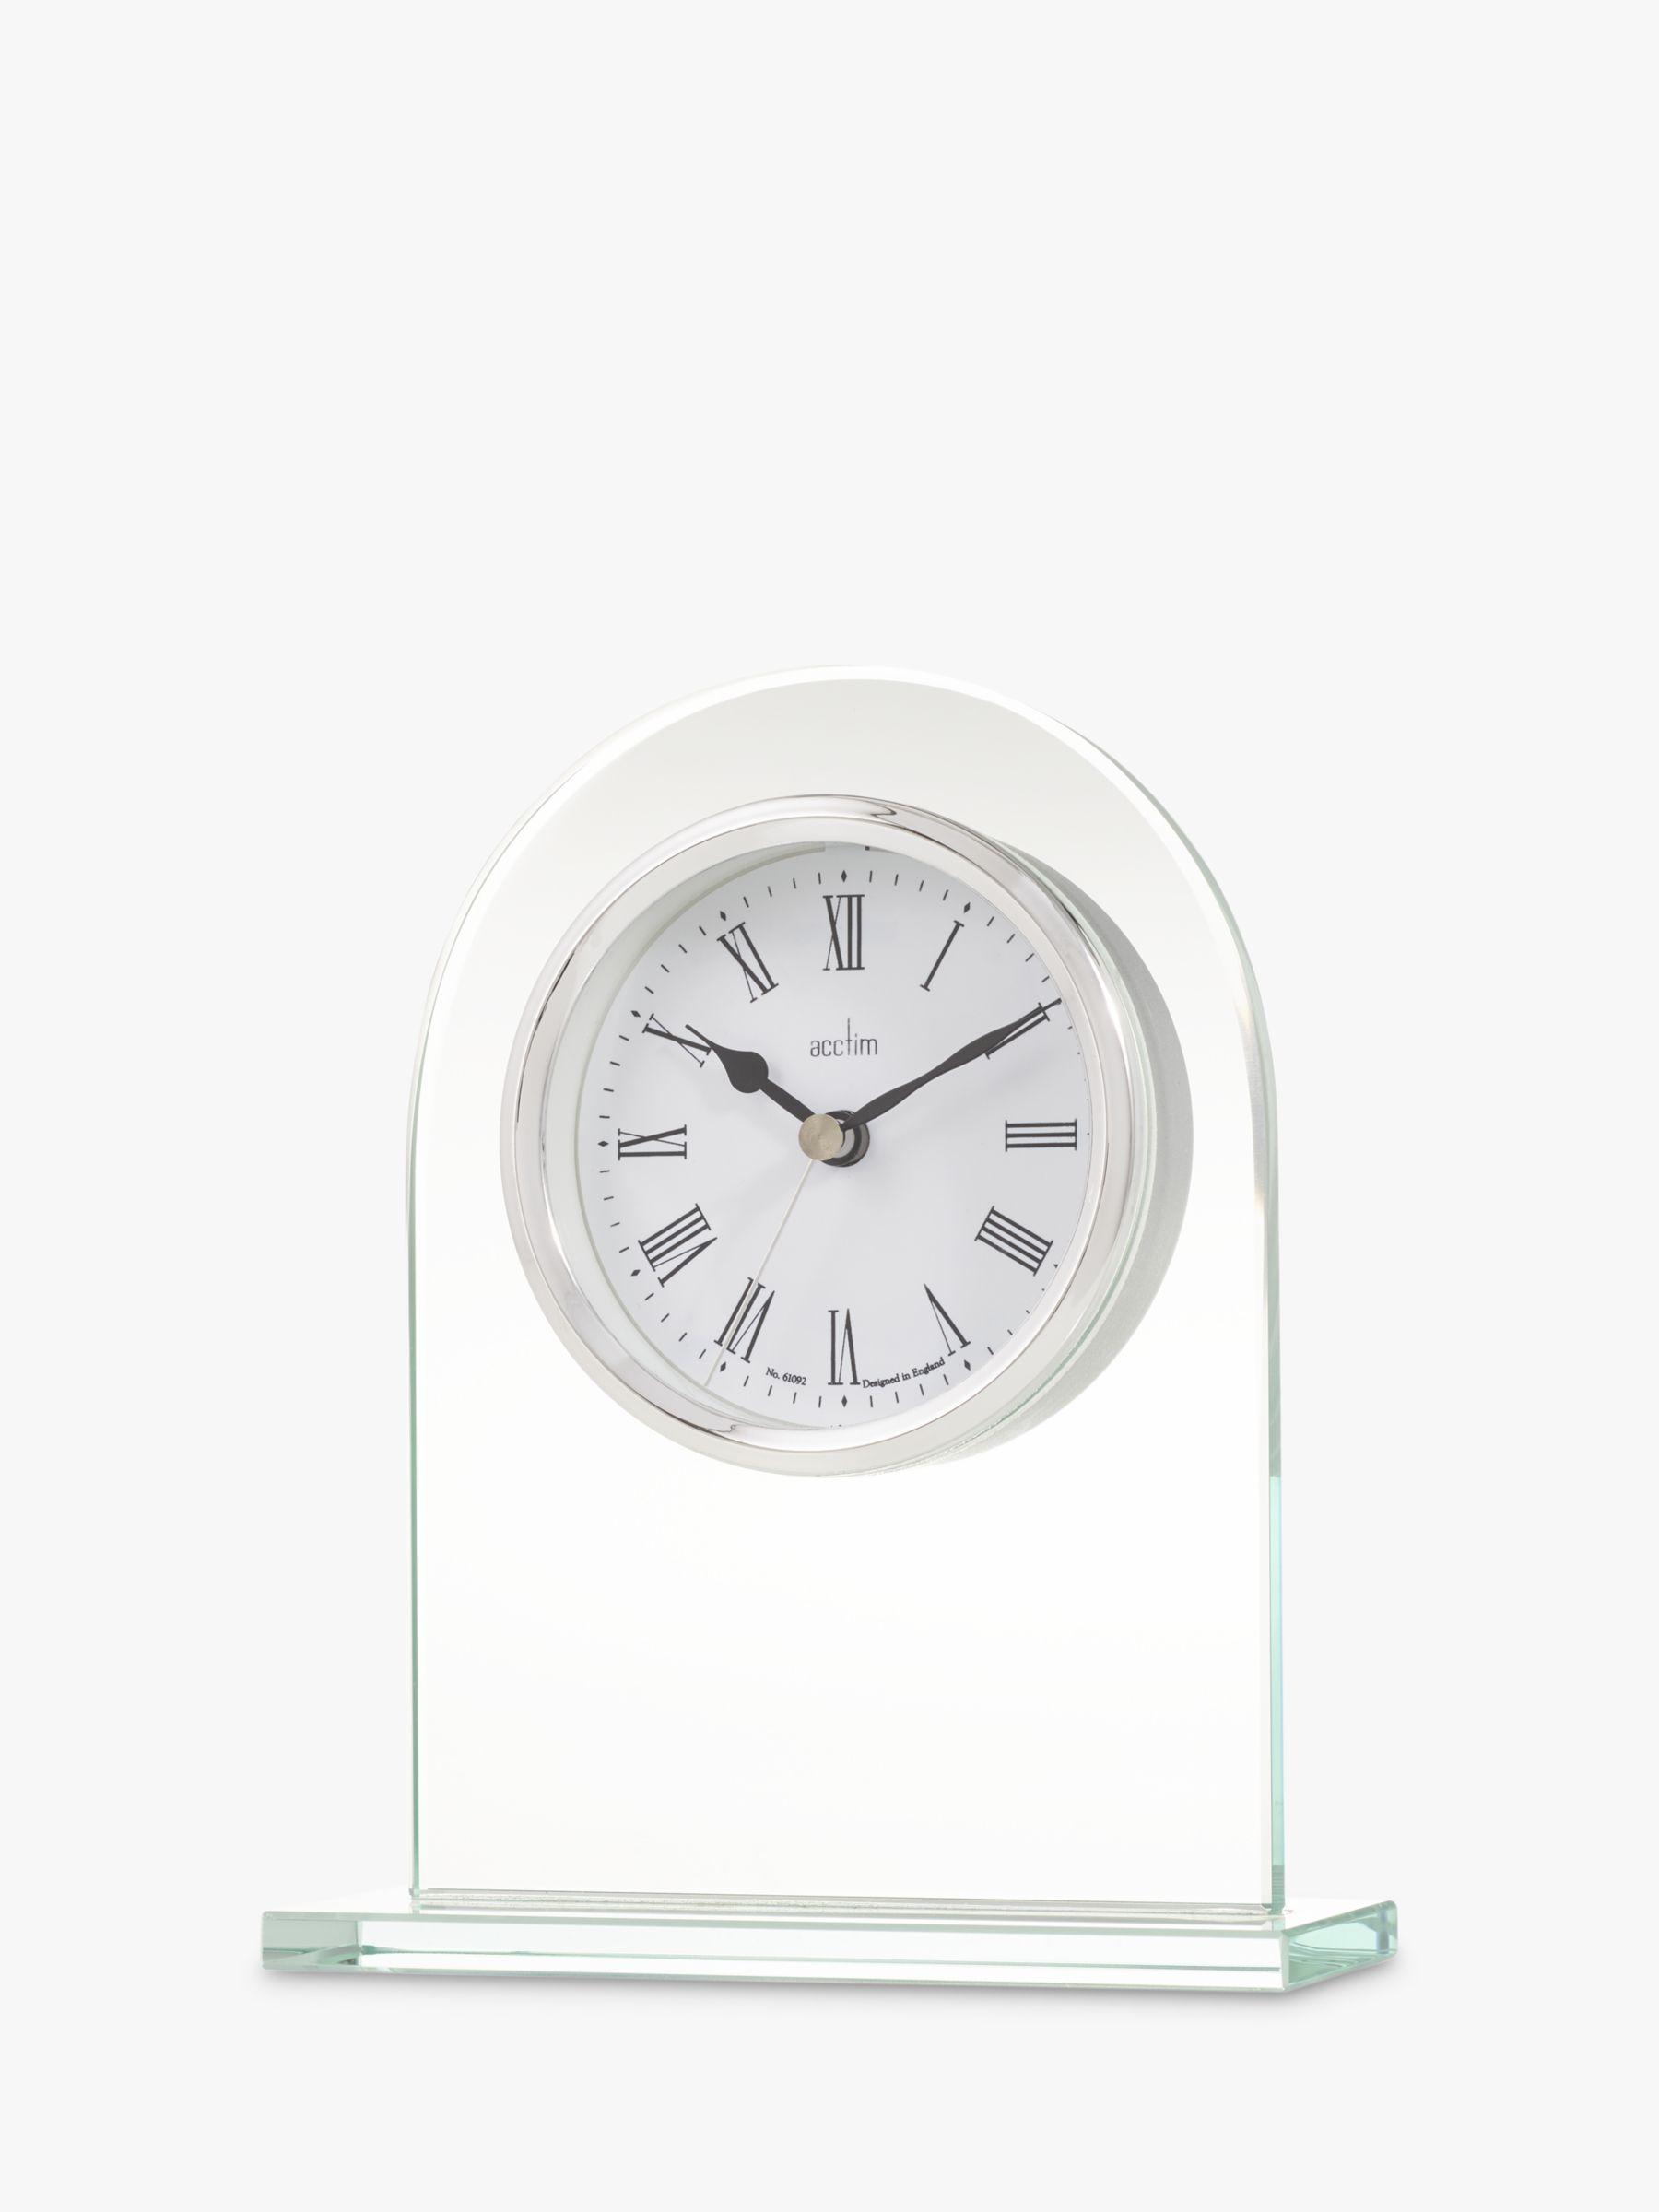 Acctim Acctim Ascott Glass Mantel Clock, Clear/Chrome, H17cm